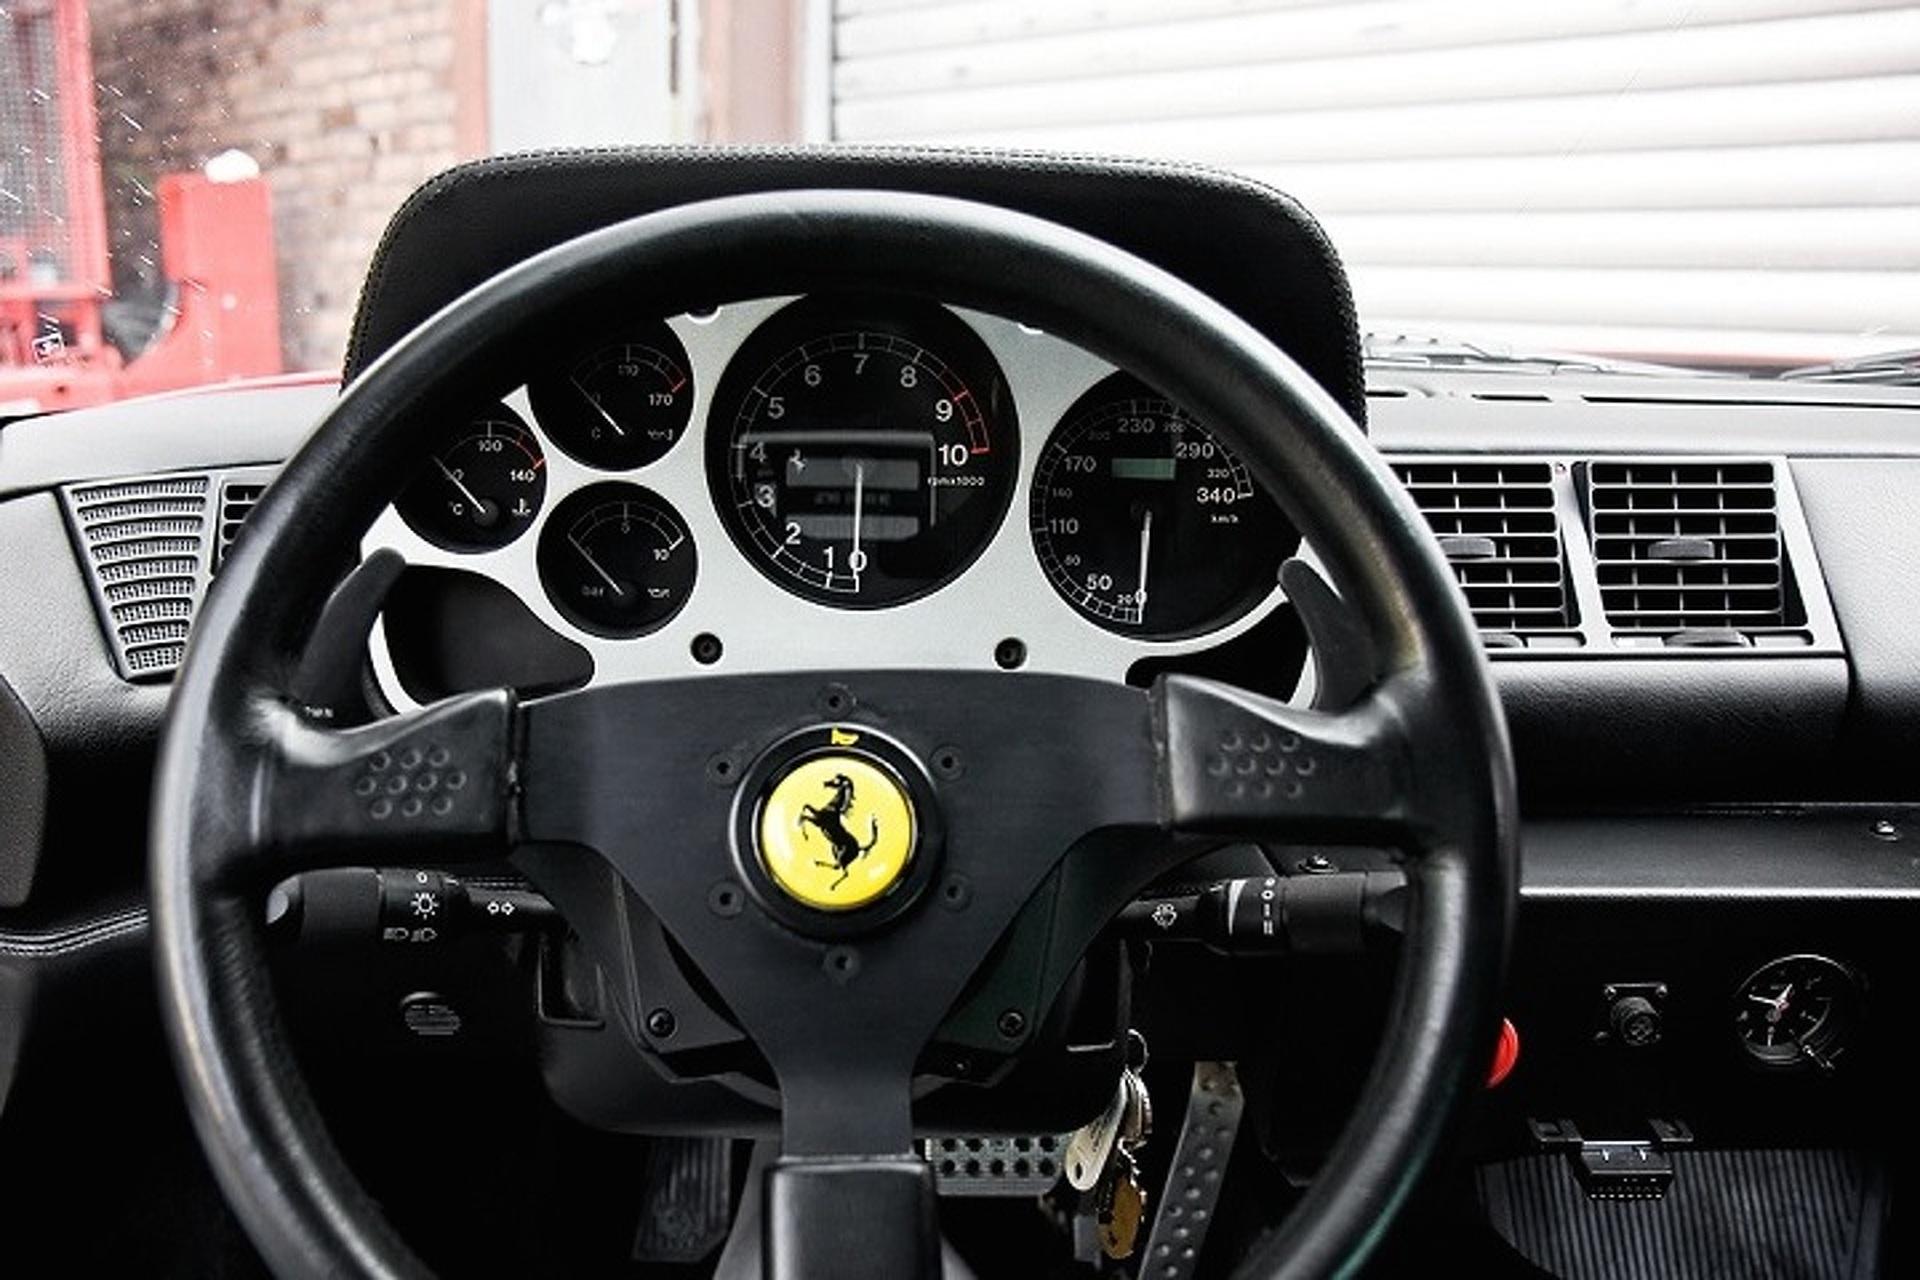 Ferrari Enzo Prototype for Sale Again